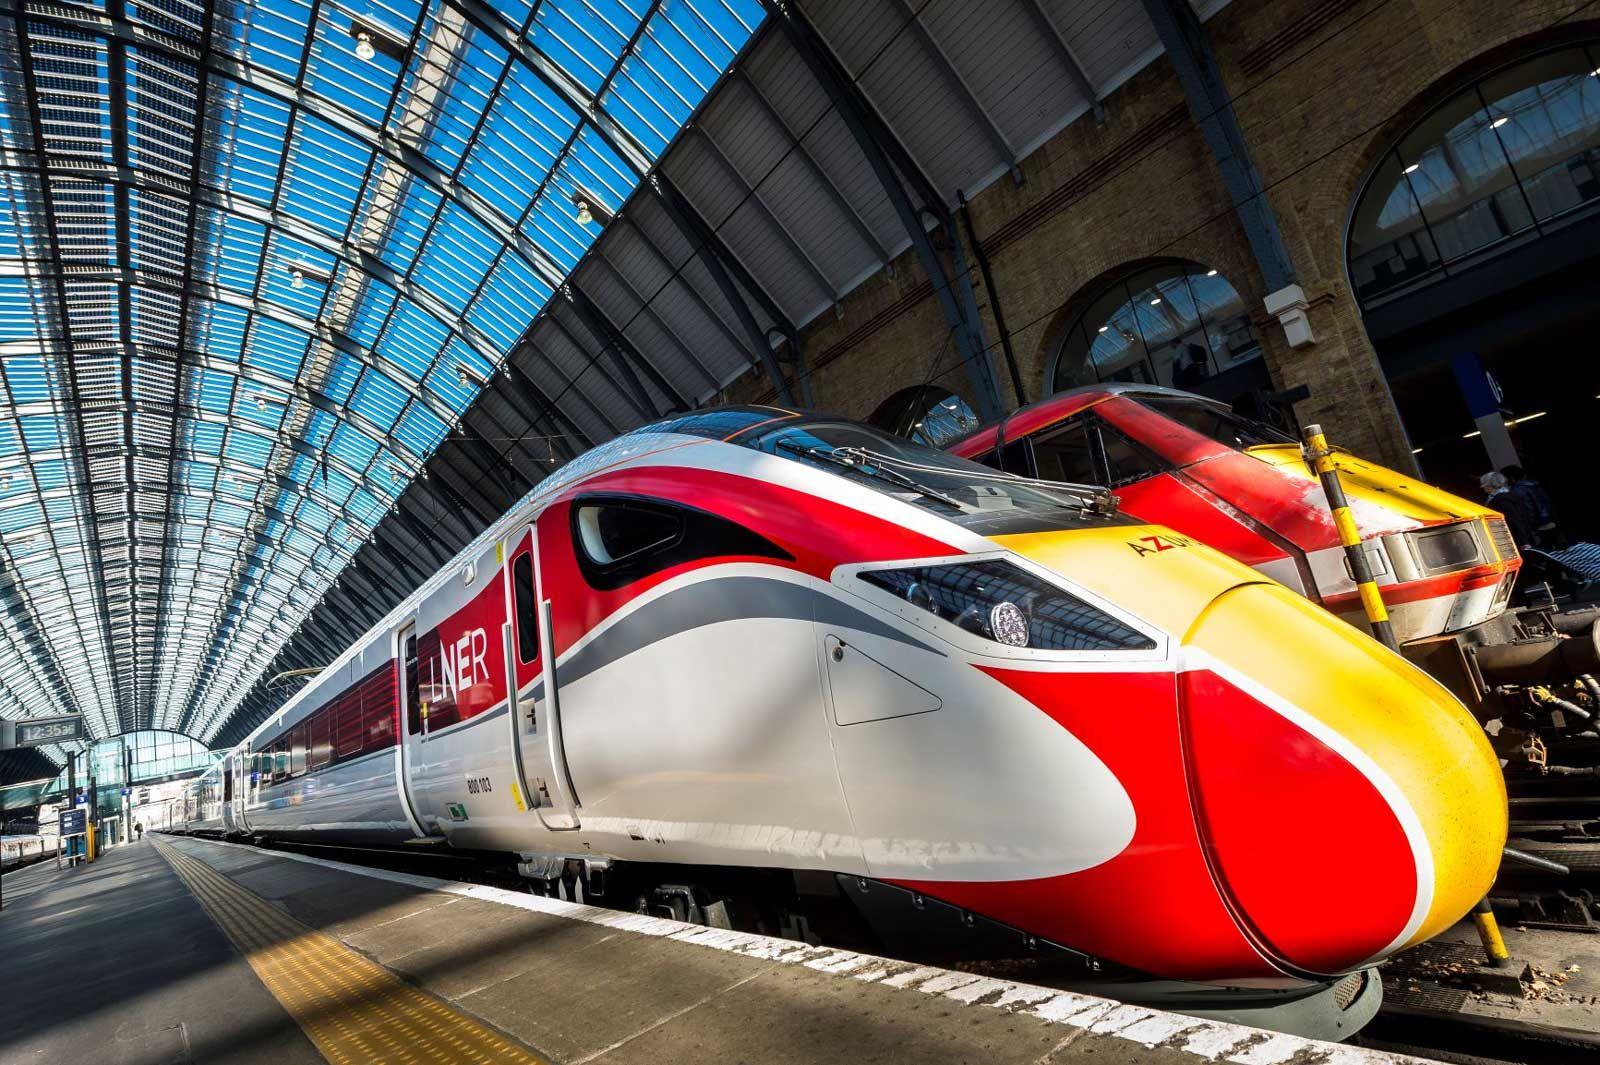 Image showing LNER trains at London Kings Cross